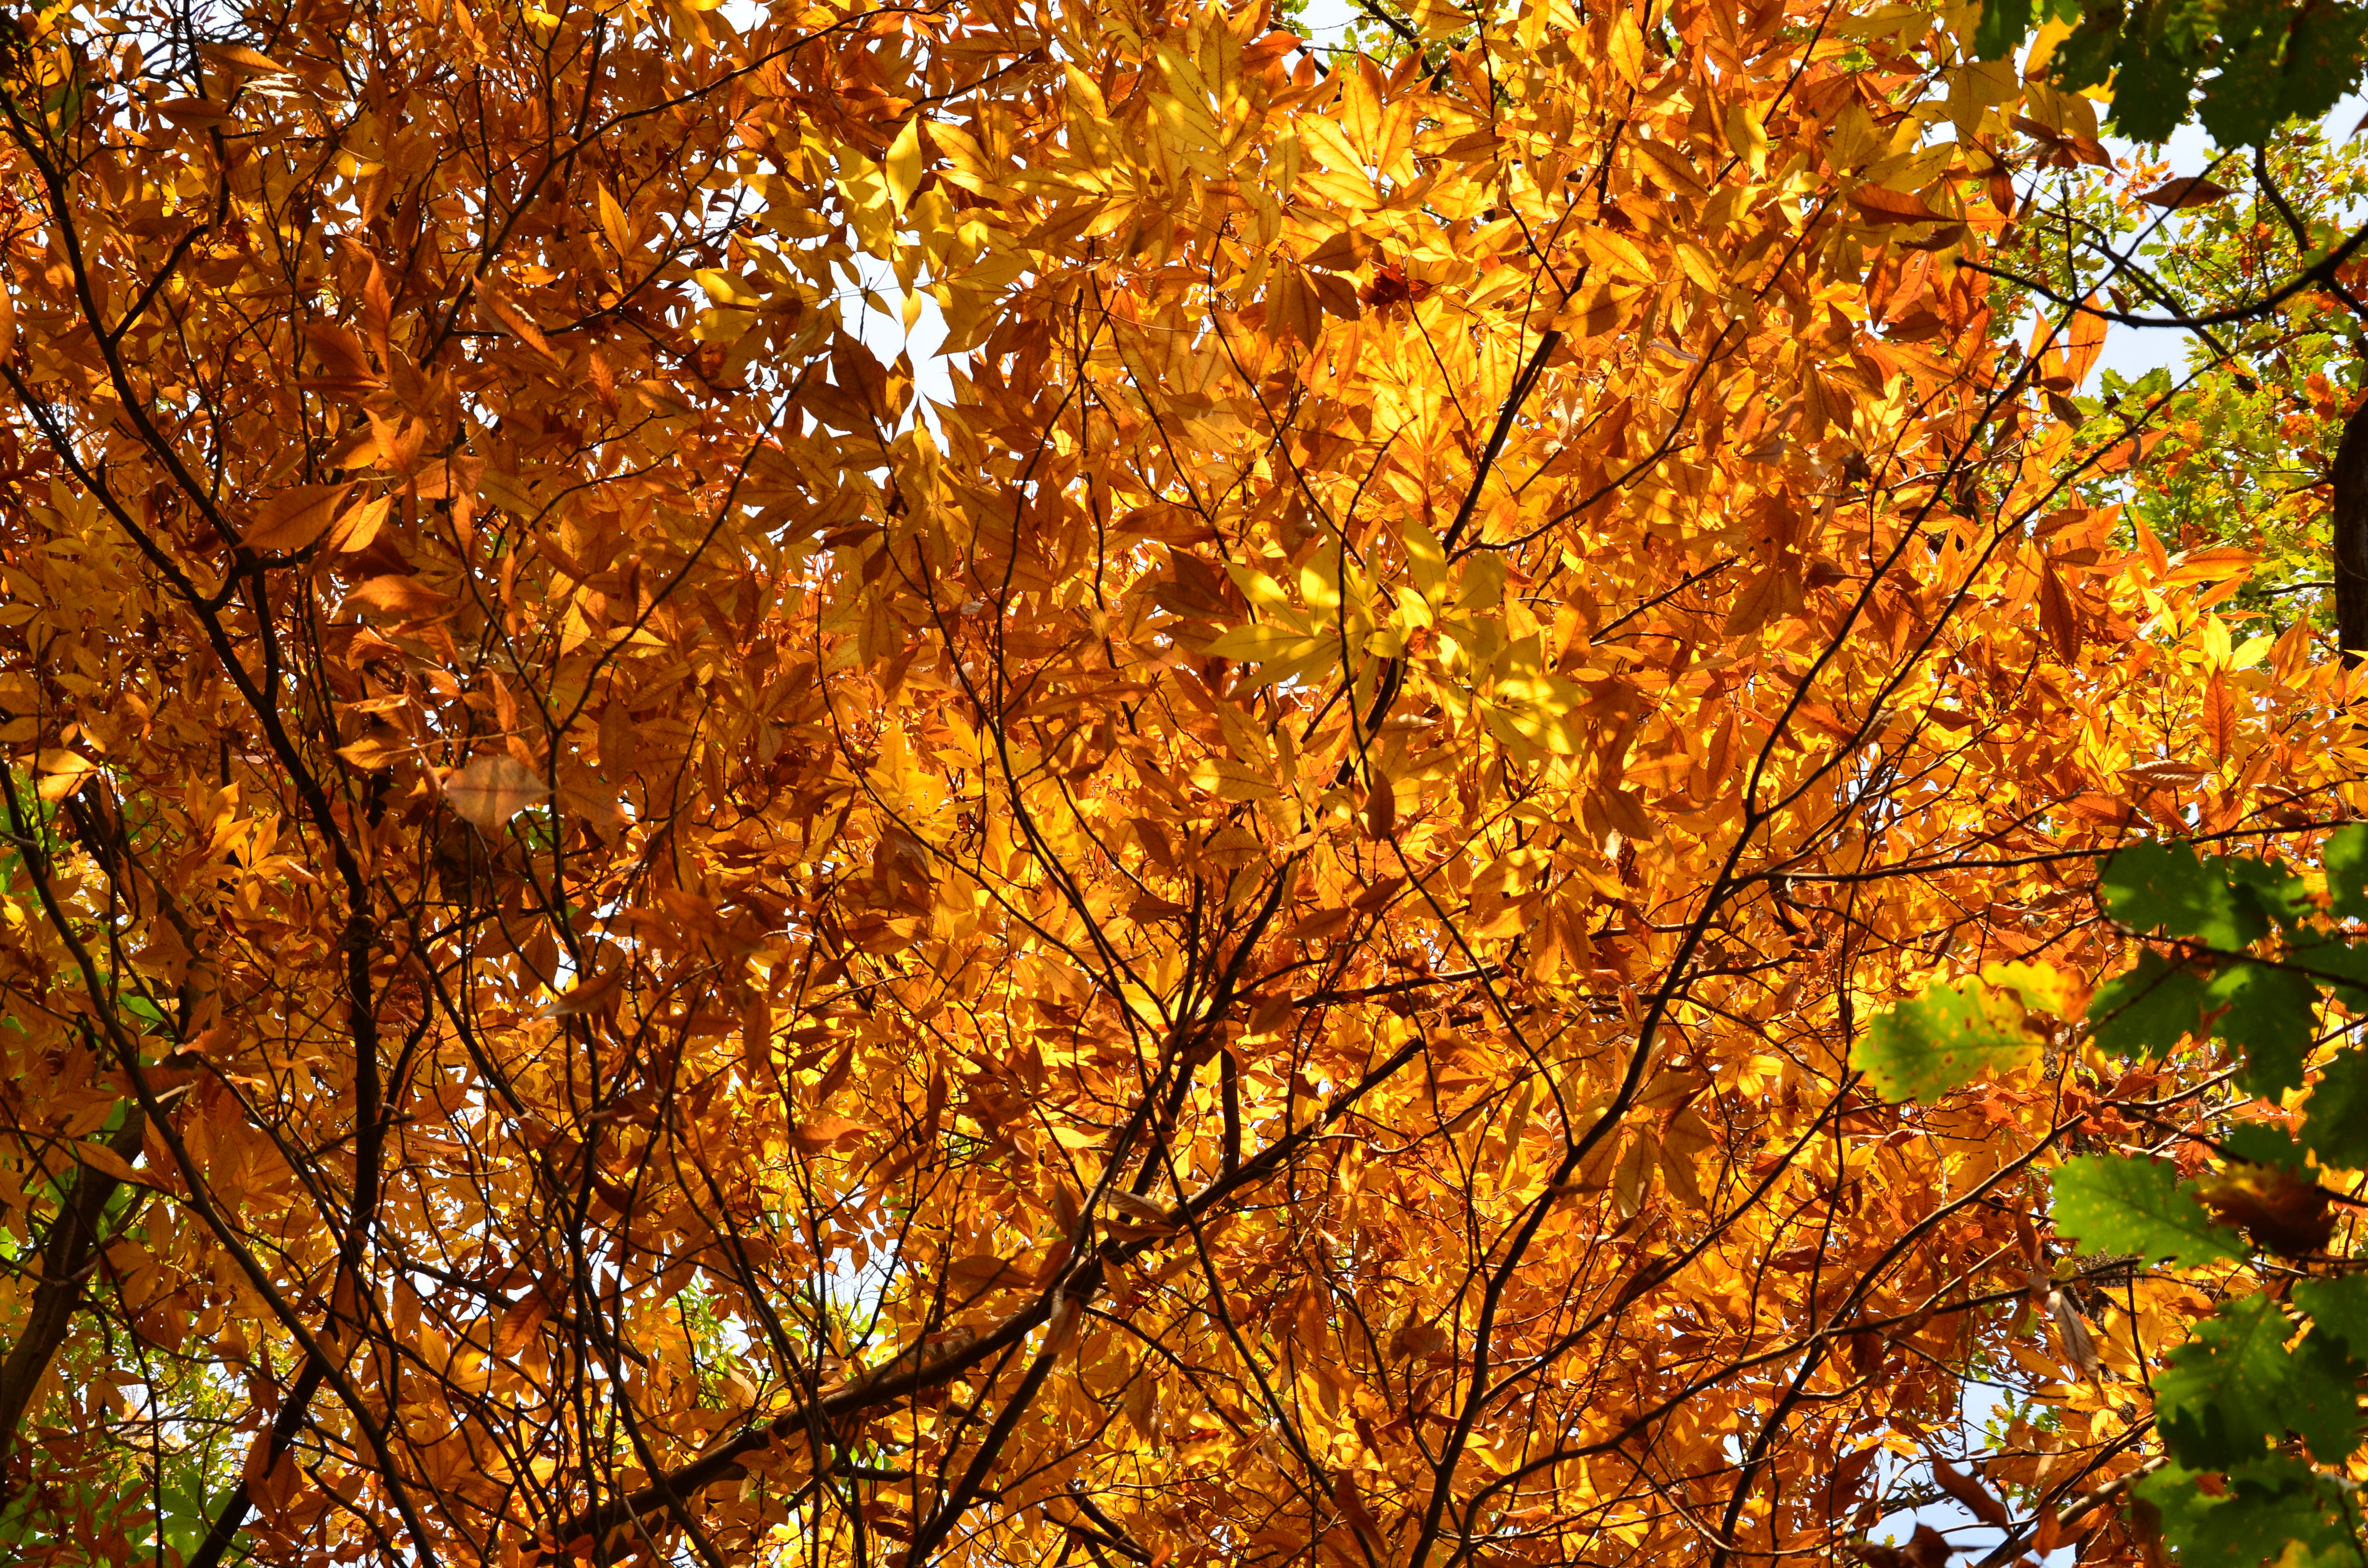 Autumn tree, Autumn, Leaf, Orange, HQ Photo